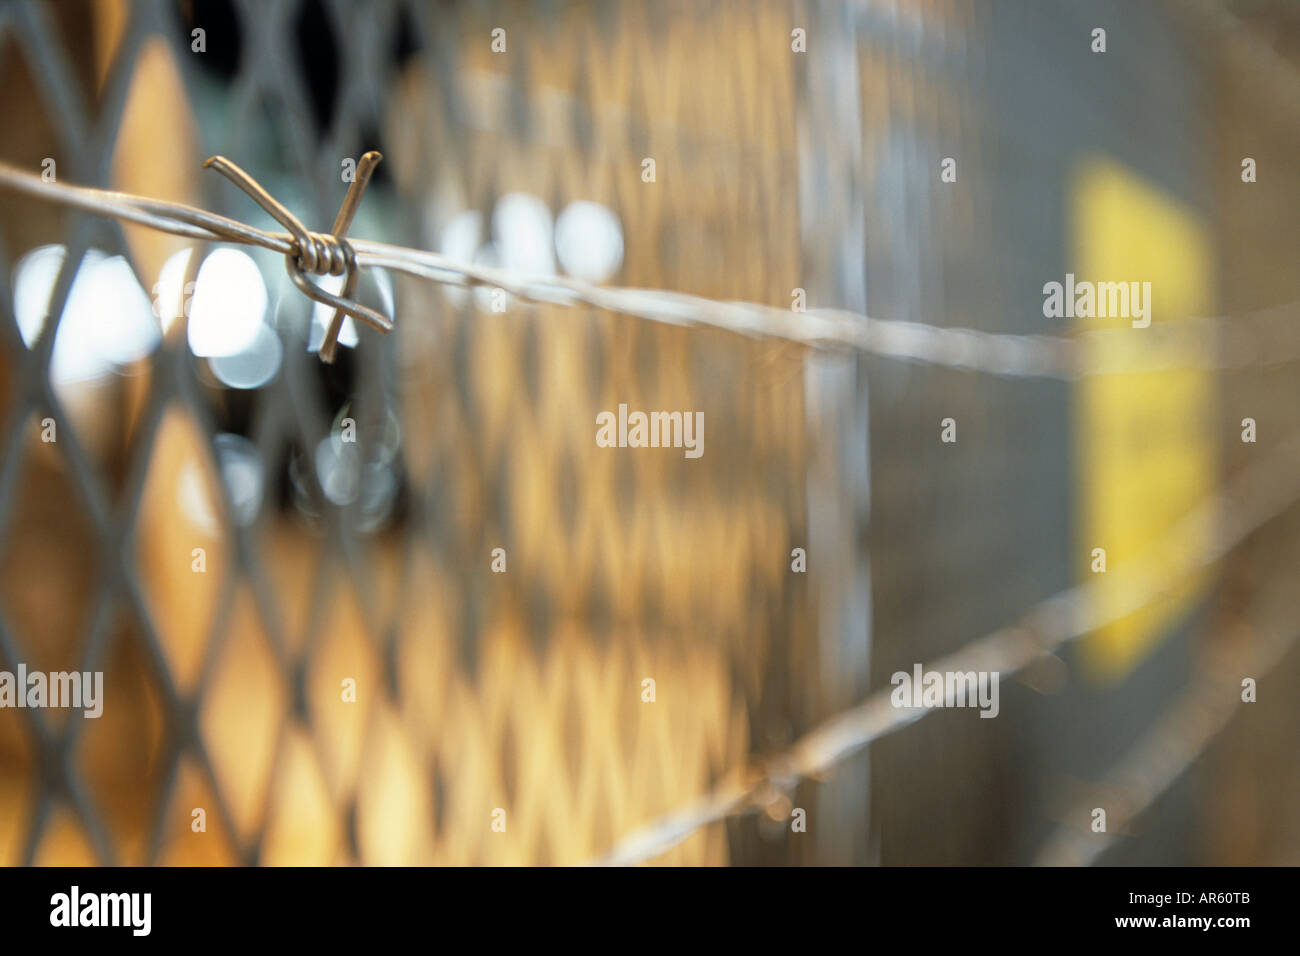 Point Alpha Stock Photos & Point Alpha Stock Images - Alamy